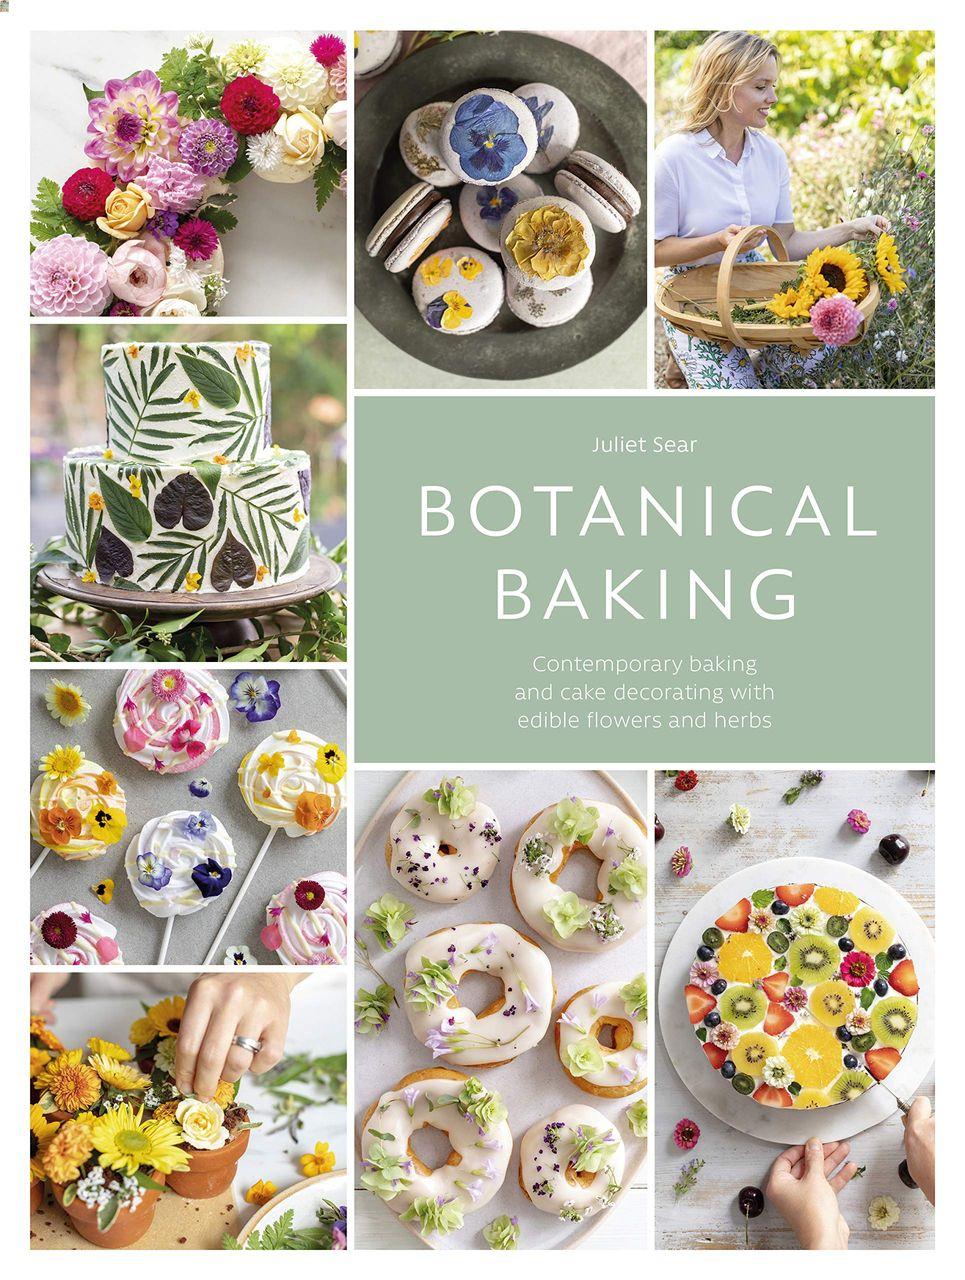 Botanical Baking by Juliet Sear